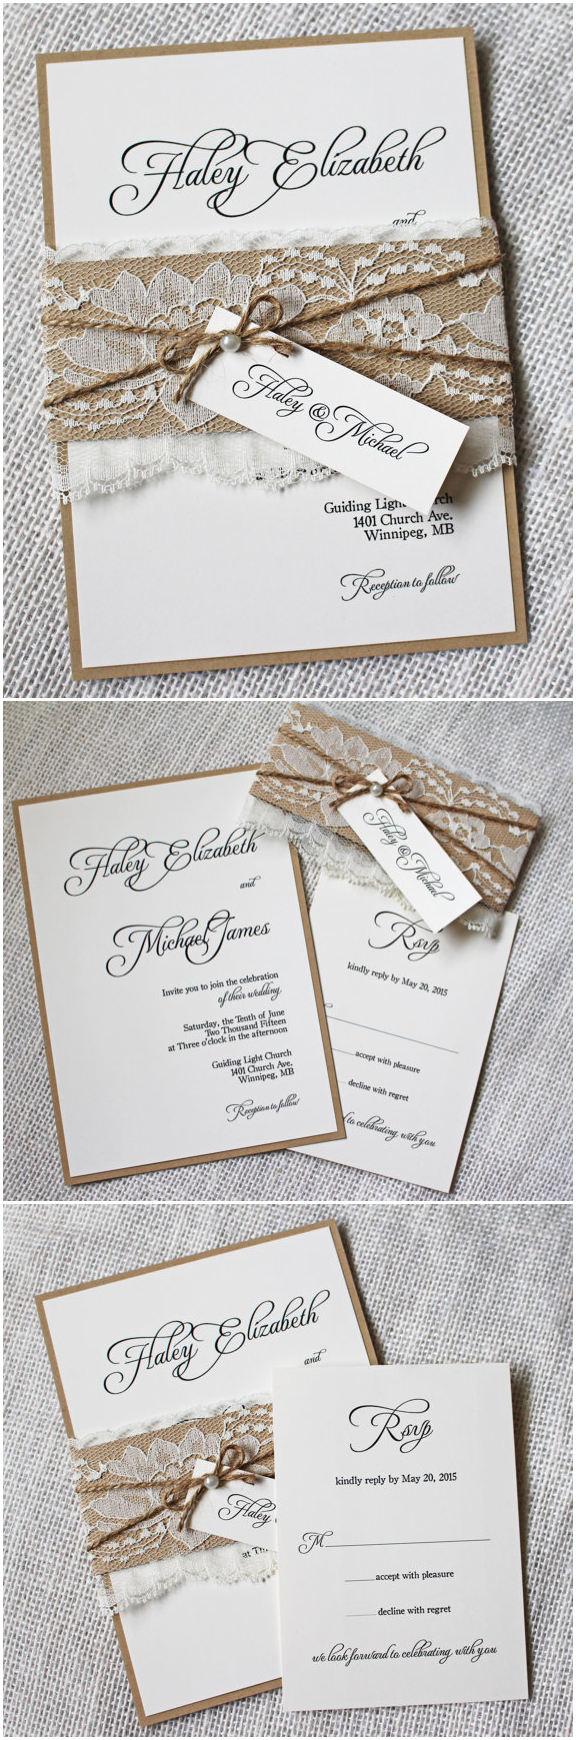 Fullsize Of Rustic Wedding Invitations